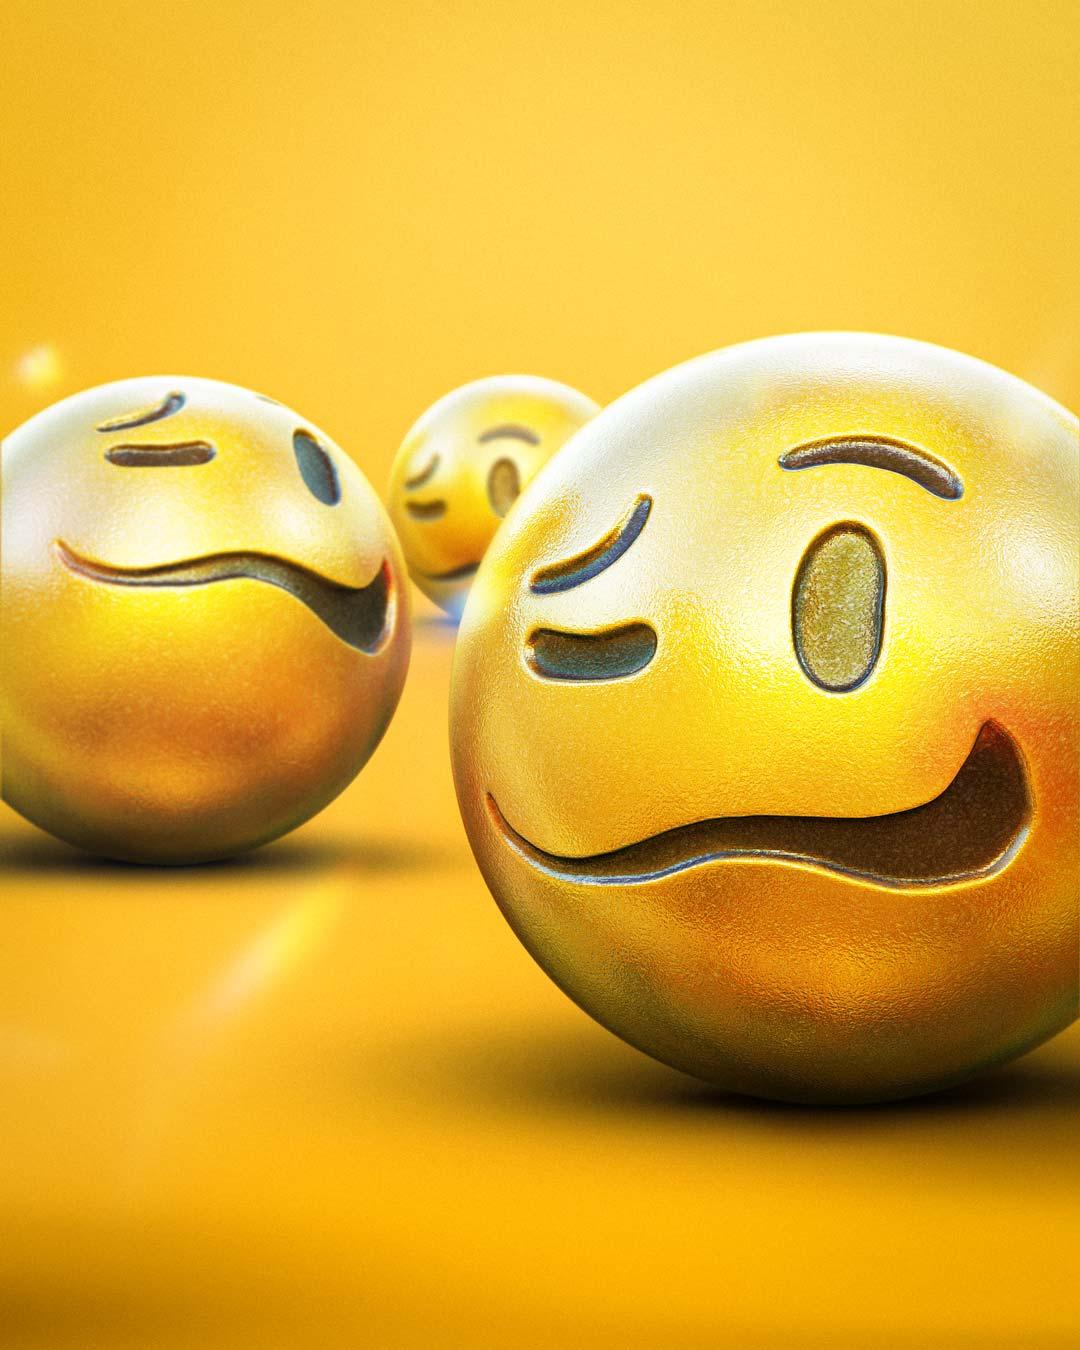 Drunk Emoji 3D Render by Adam Ingle